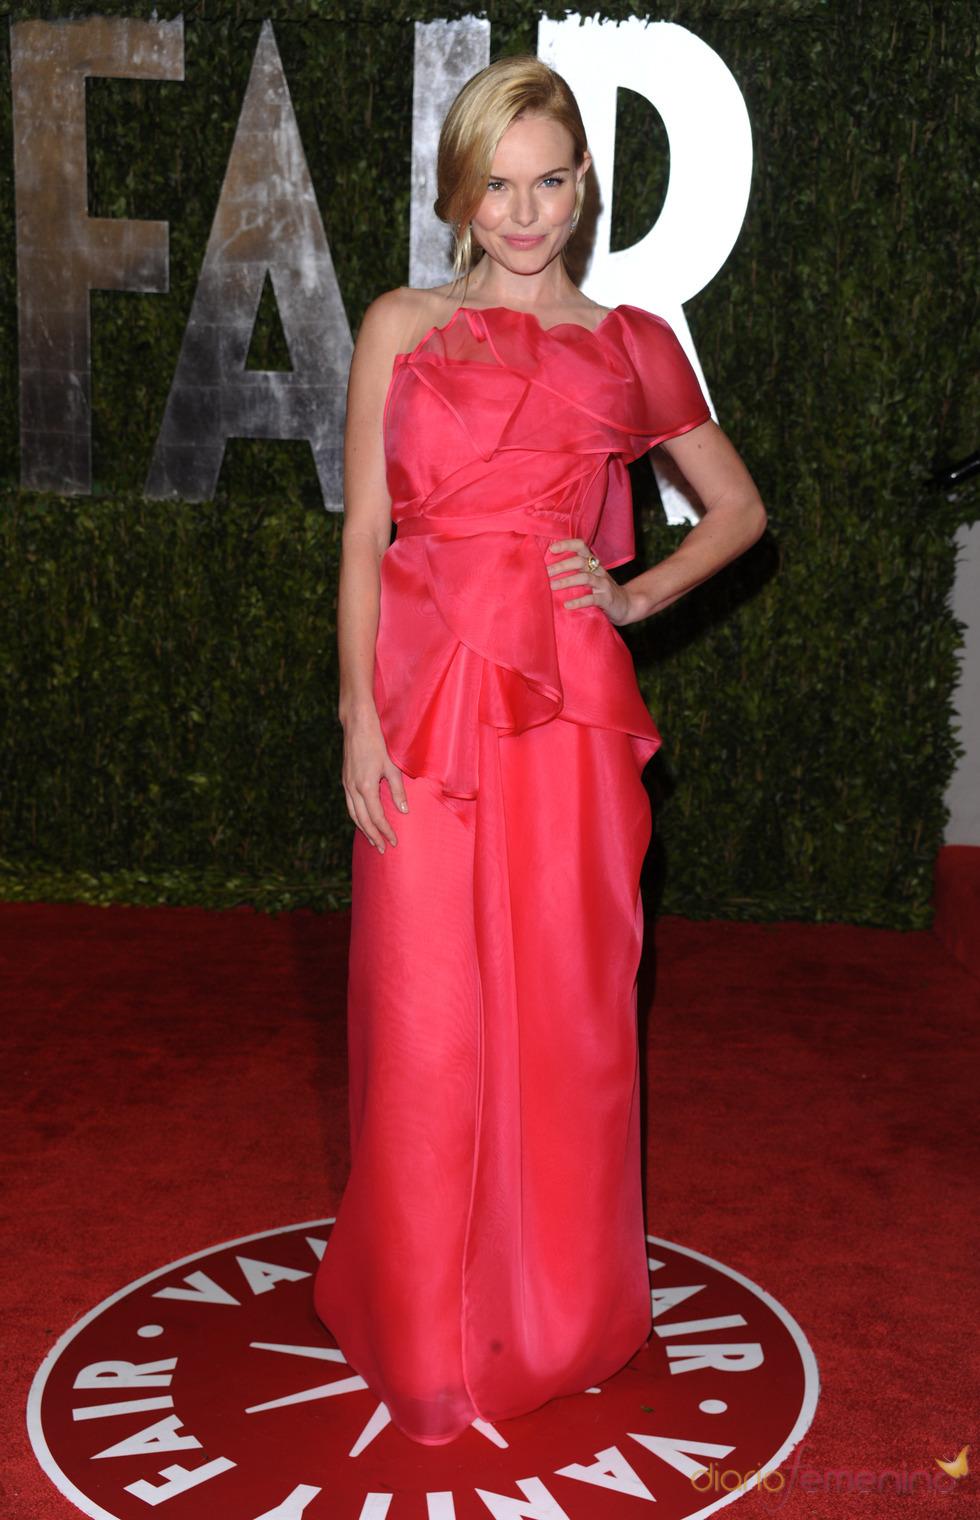 Kate Bosworth en la fiesta Vanity Fair Oscar 2010